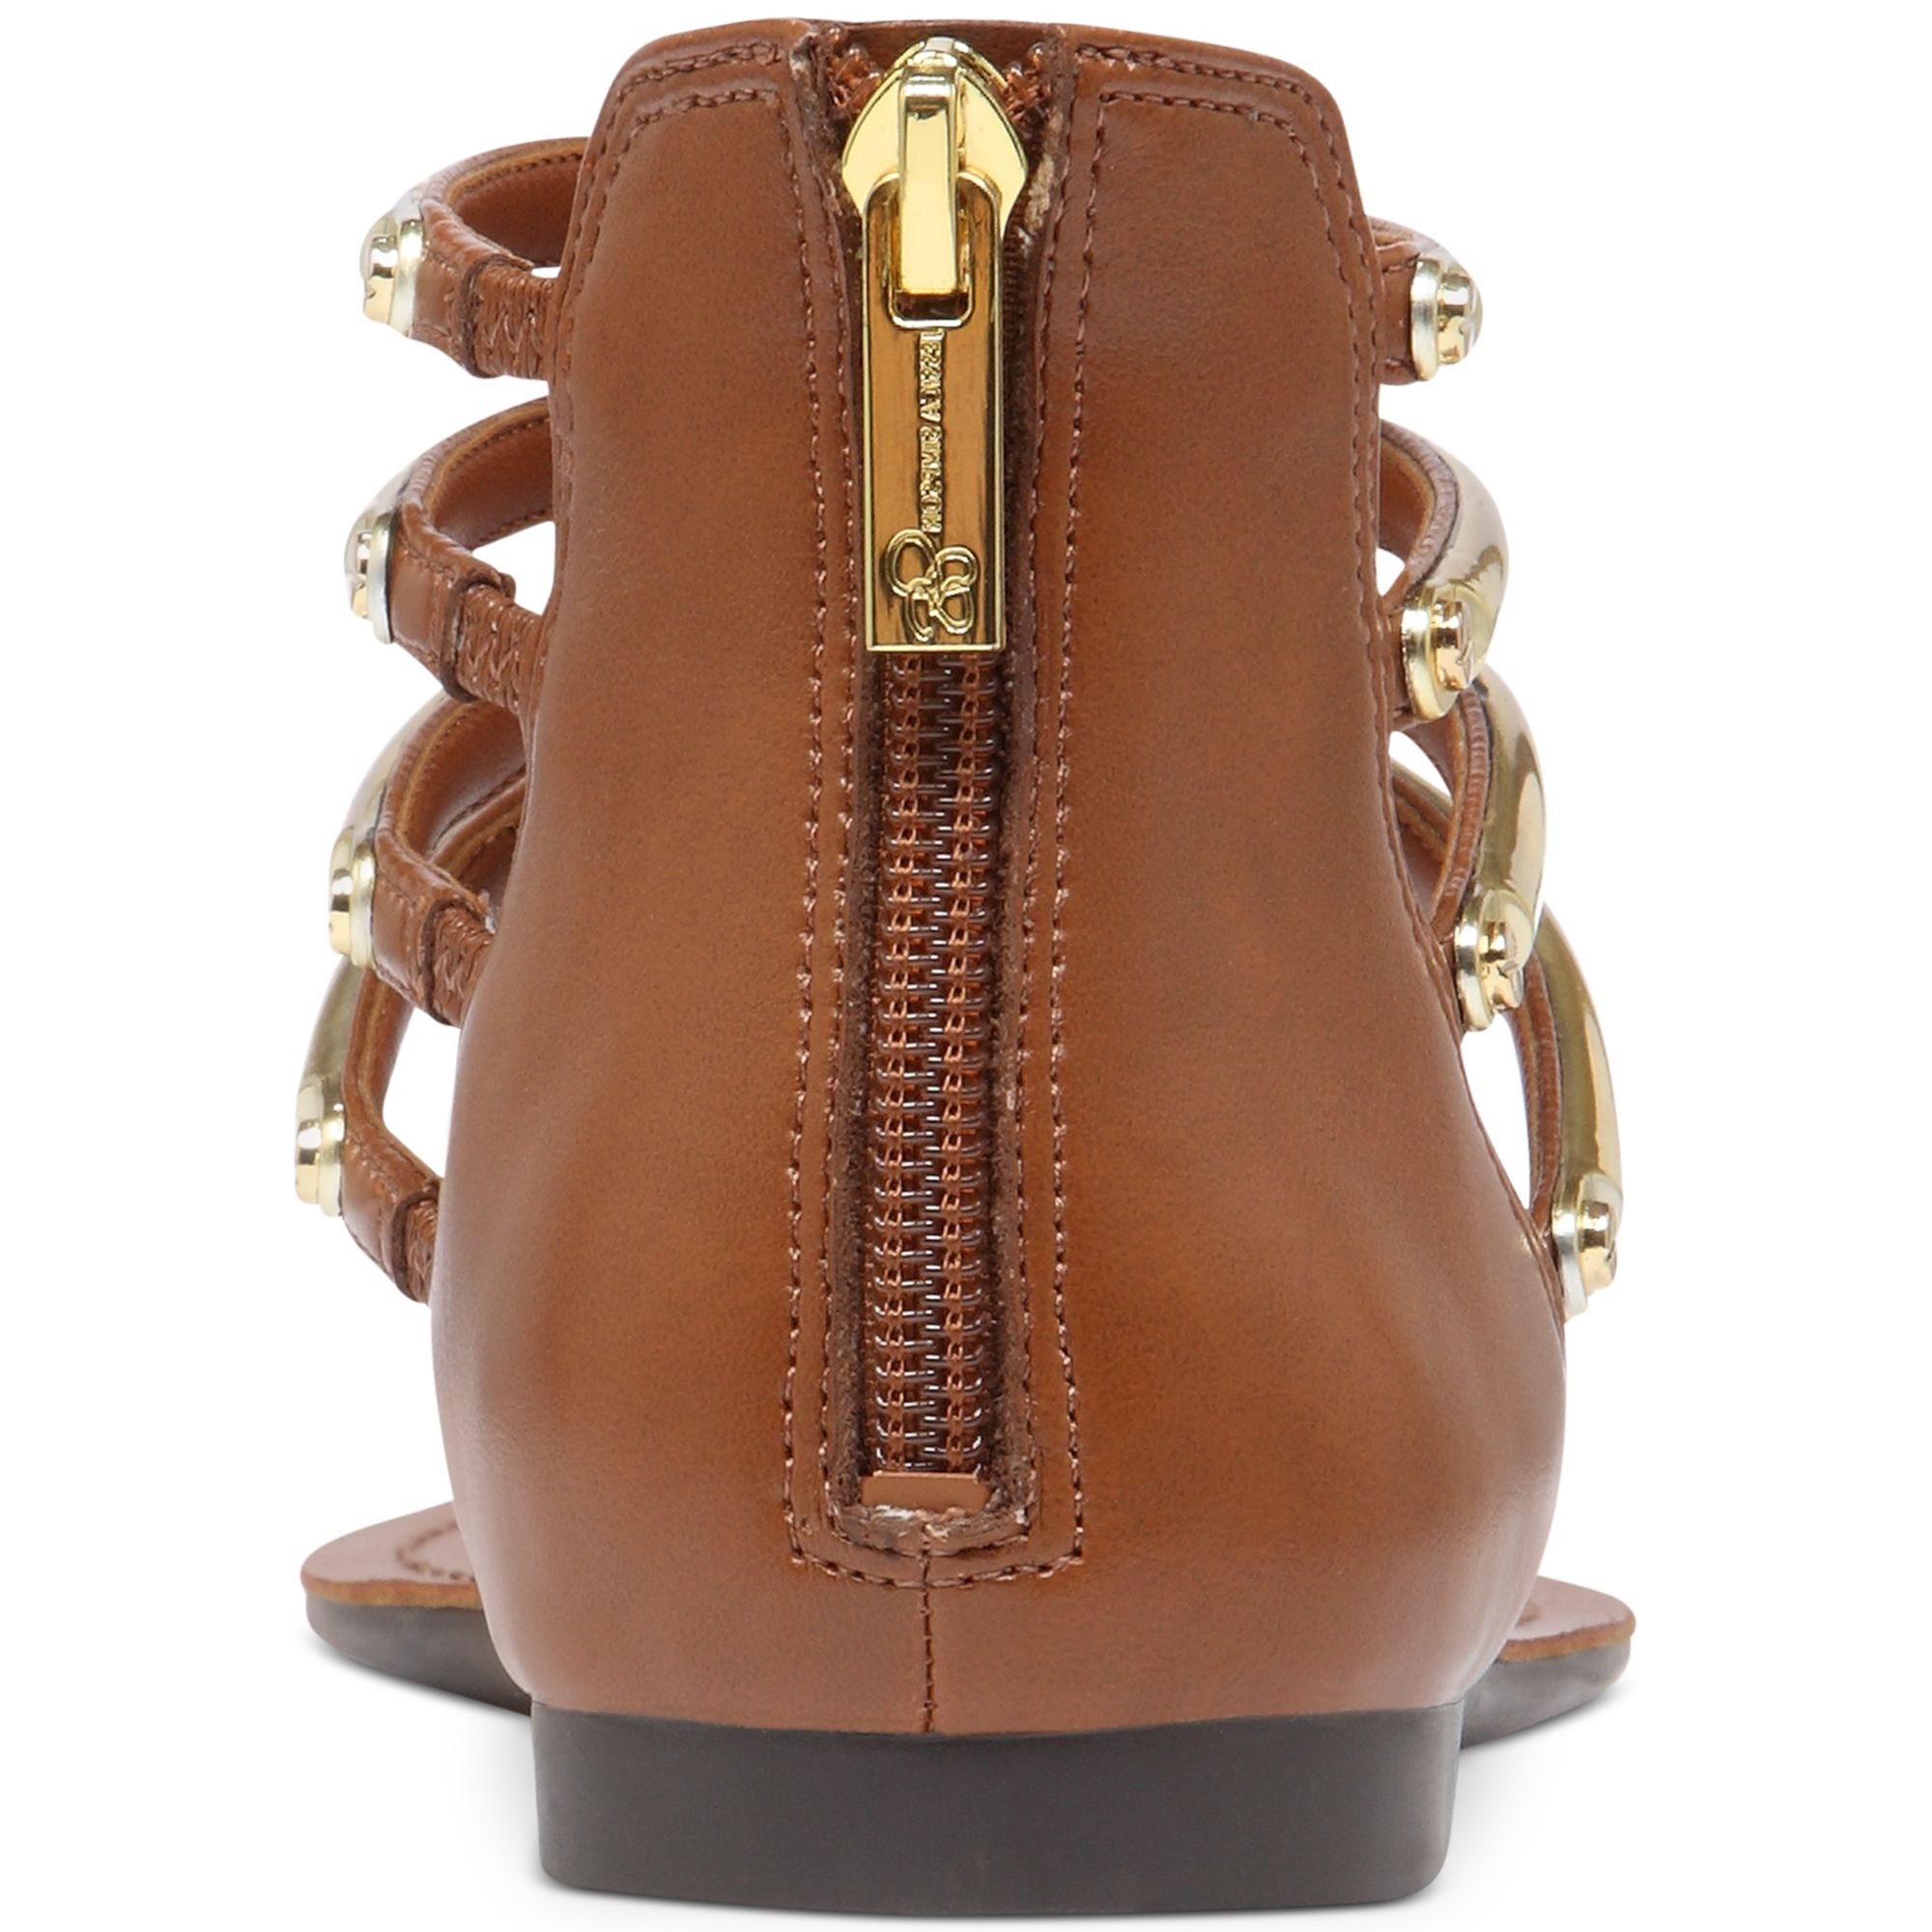 57d5fdf79119 Lyst - Jessica Simpson Gionara Flat Thong Sandals in Metallic